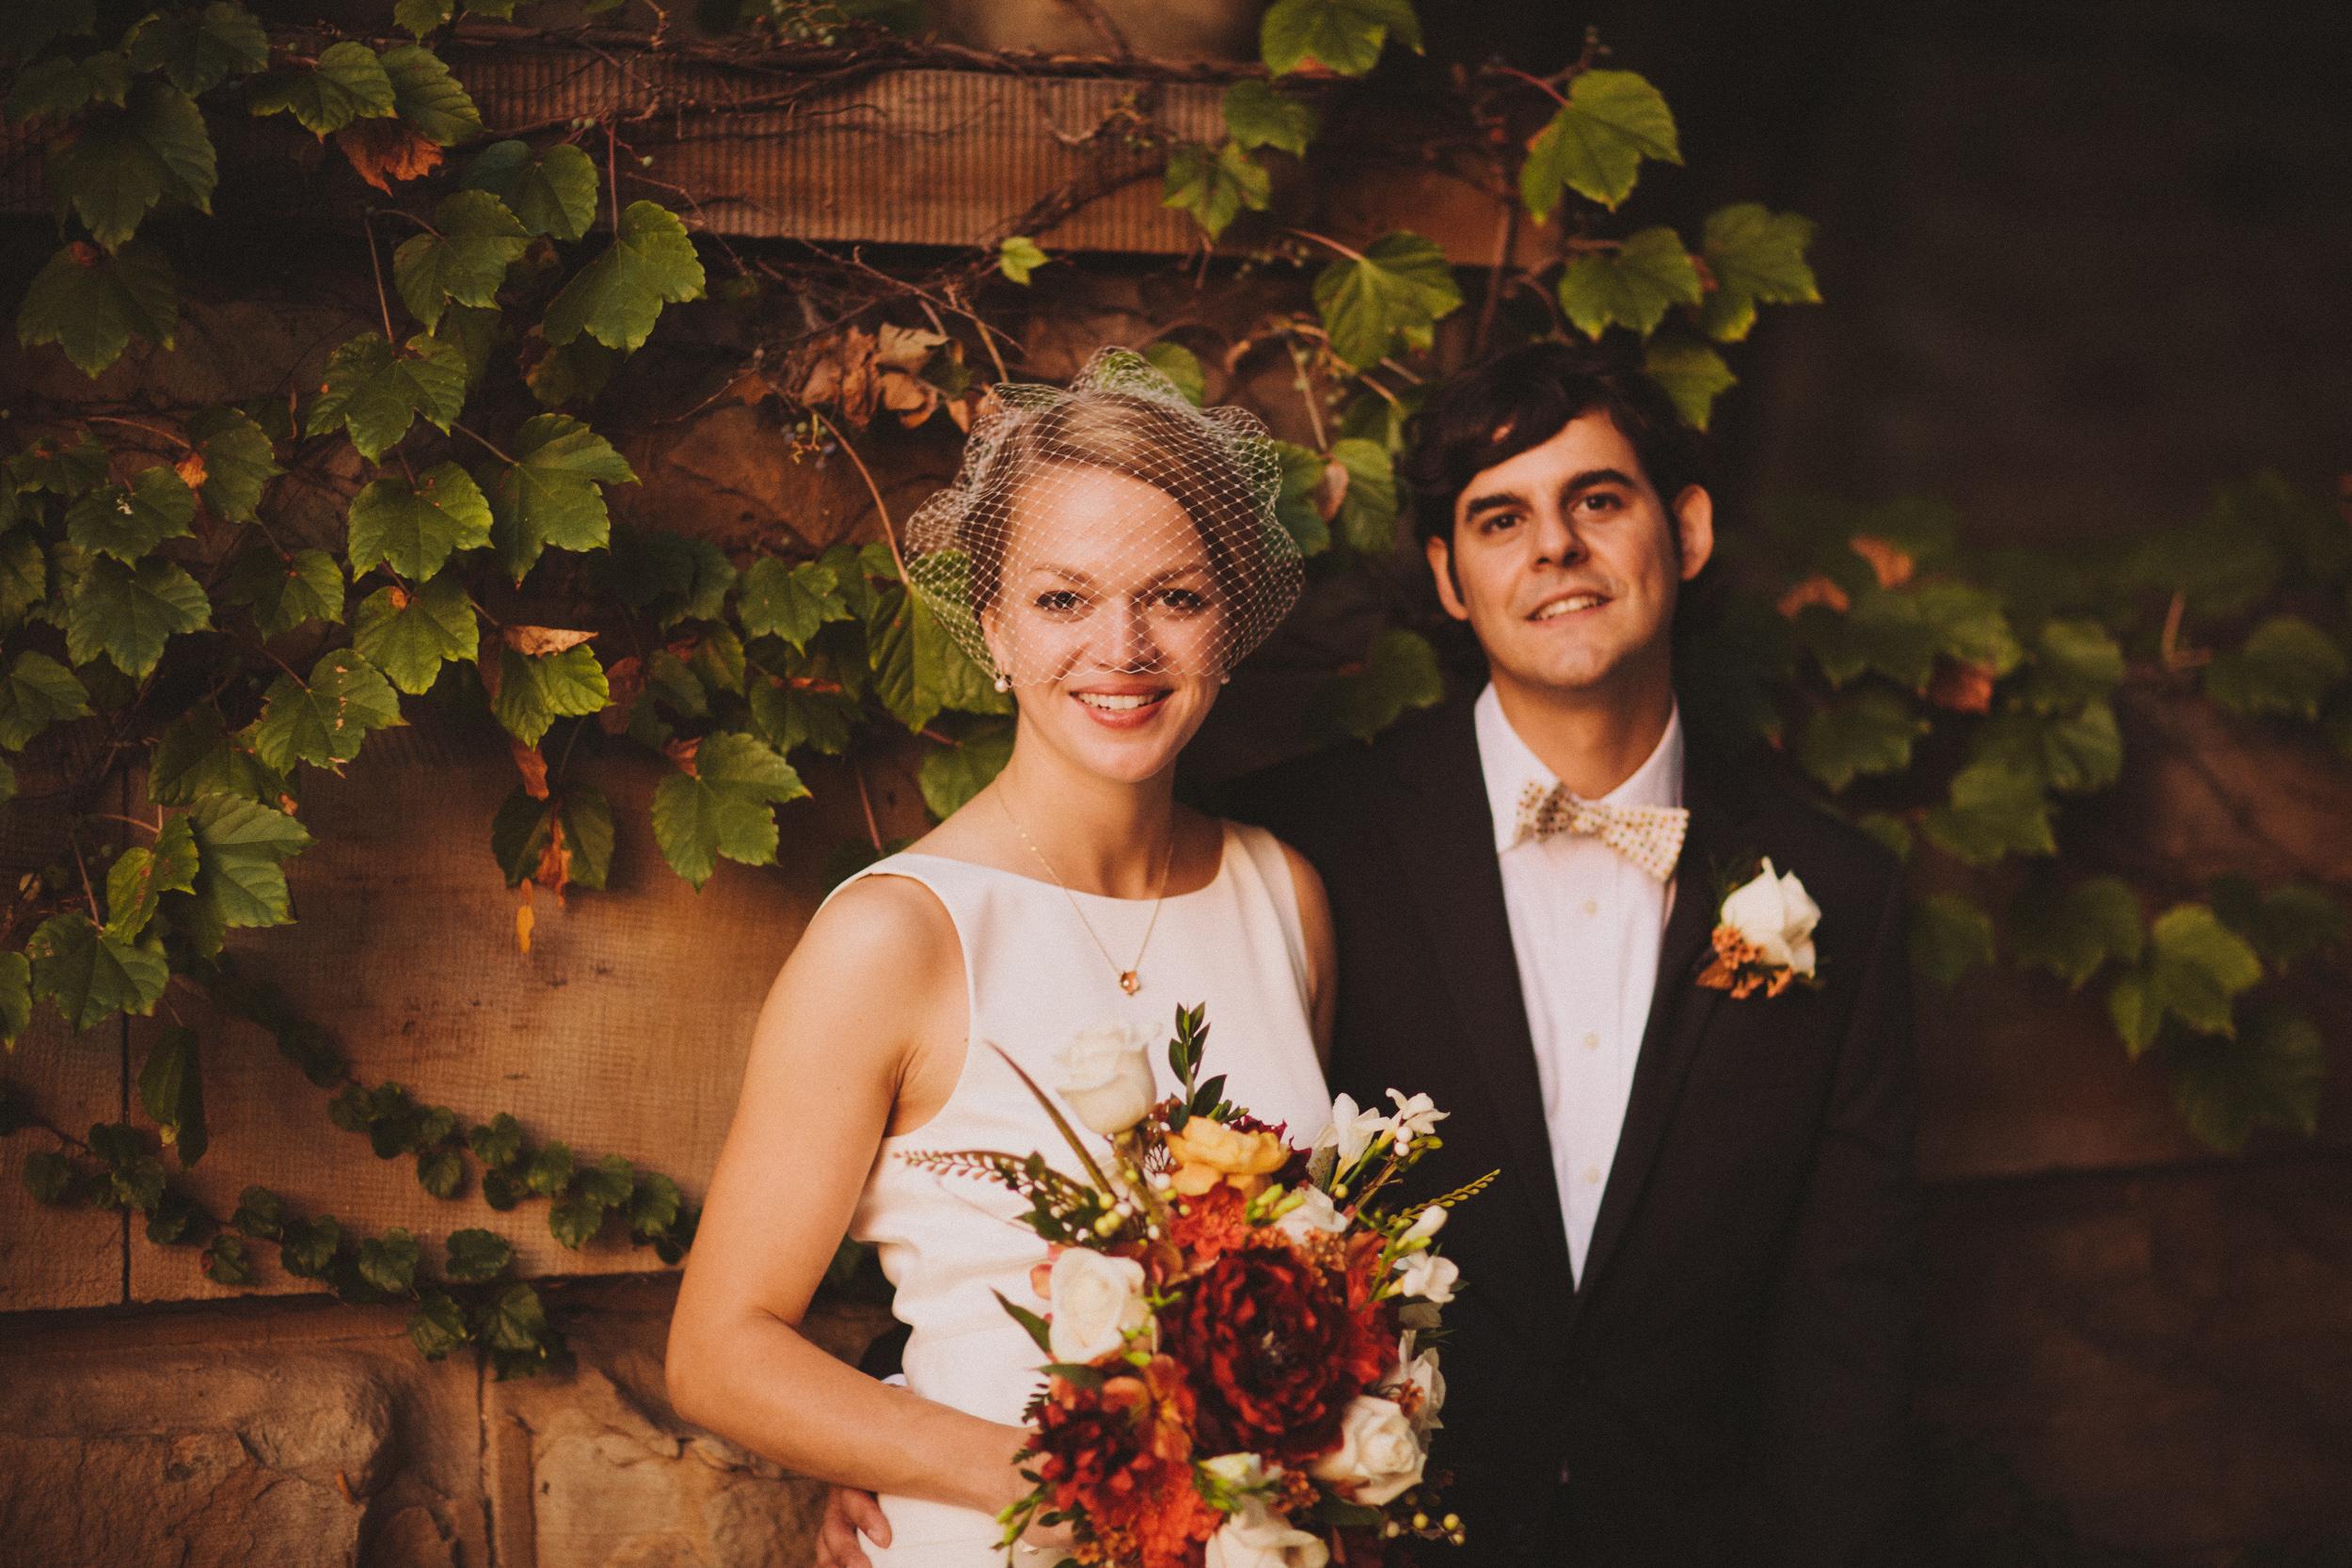 10-05-2013 maggie & adam wedding photography by brian milo-150.jpg